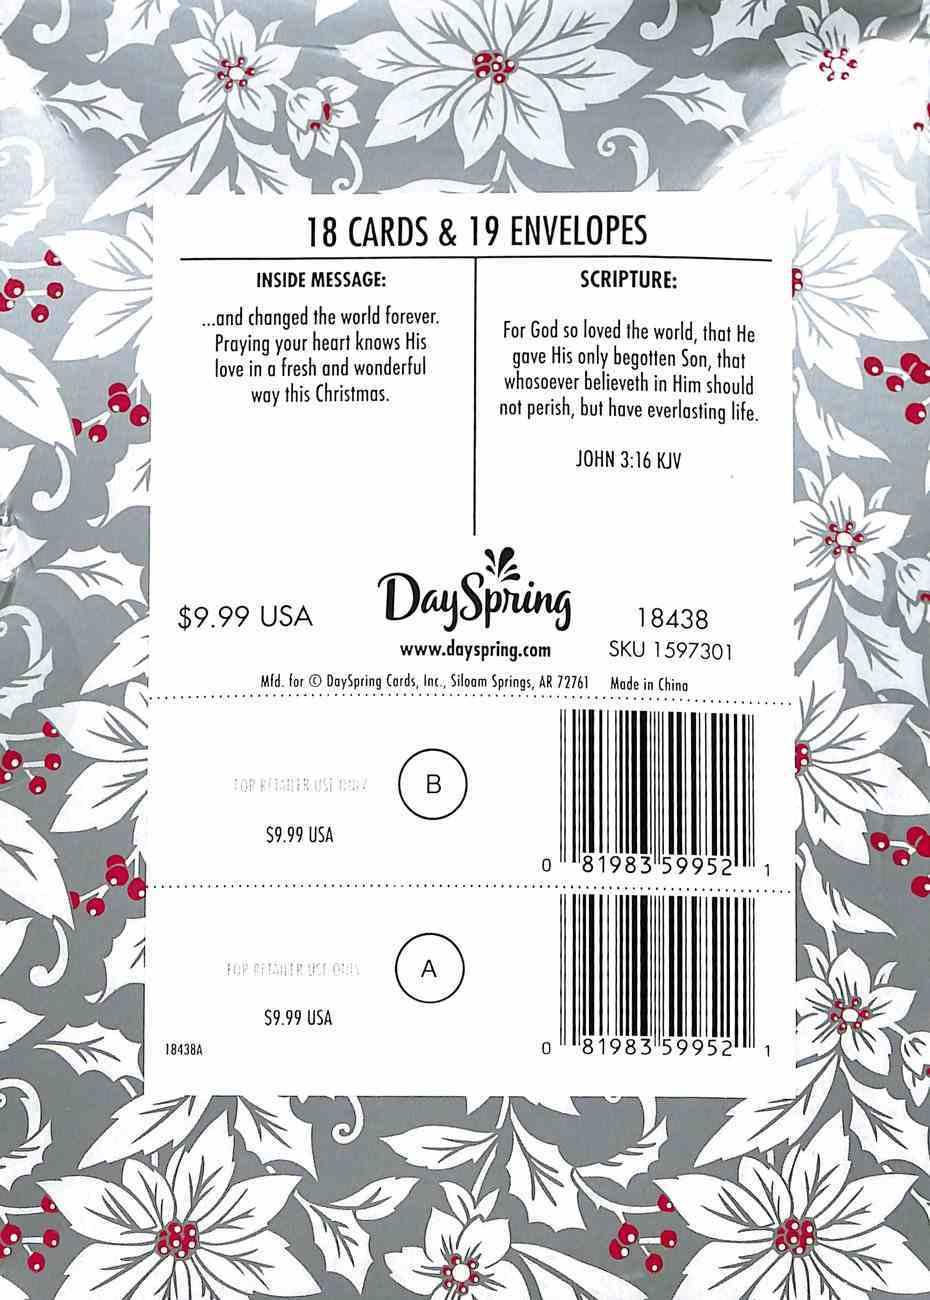 Christmas Boxed Cards: Love Came Down (John 3:16 Kjv) Box